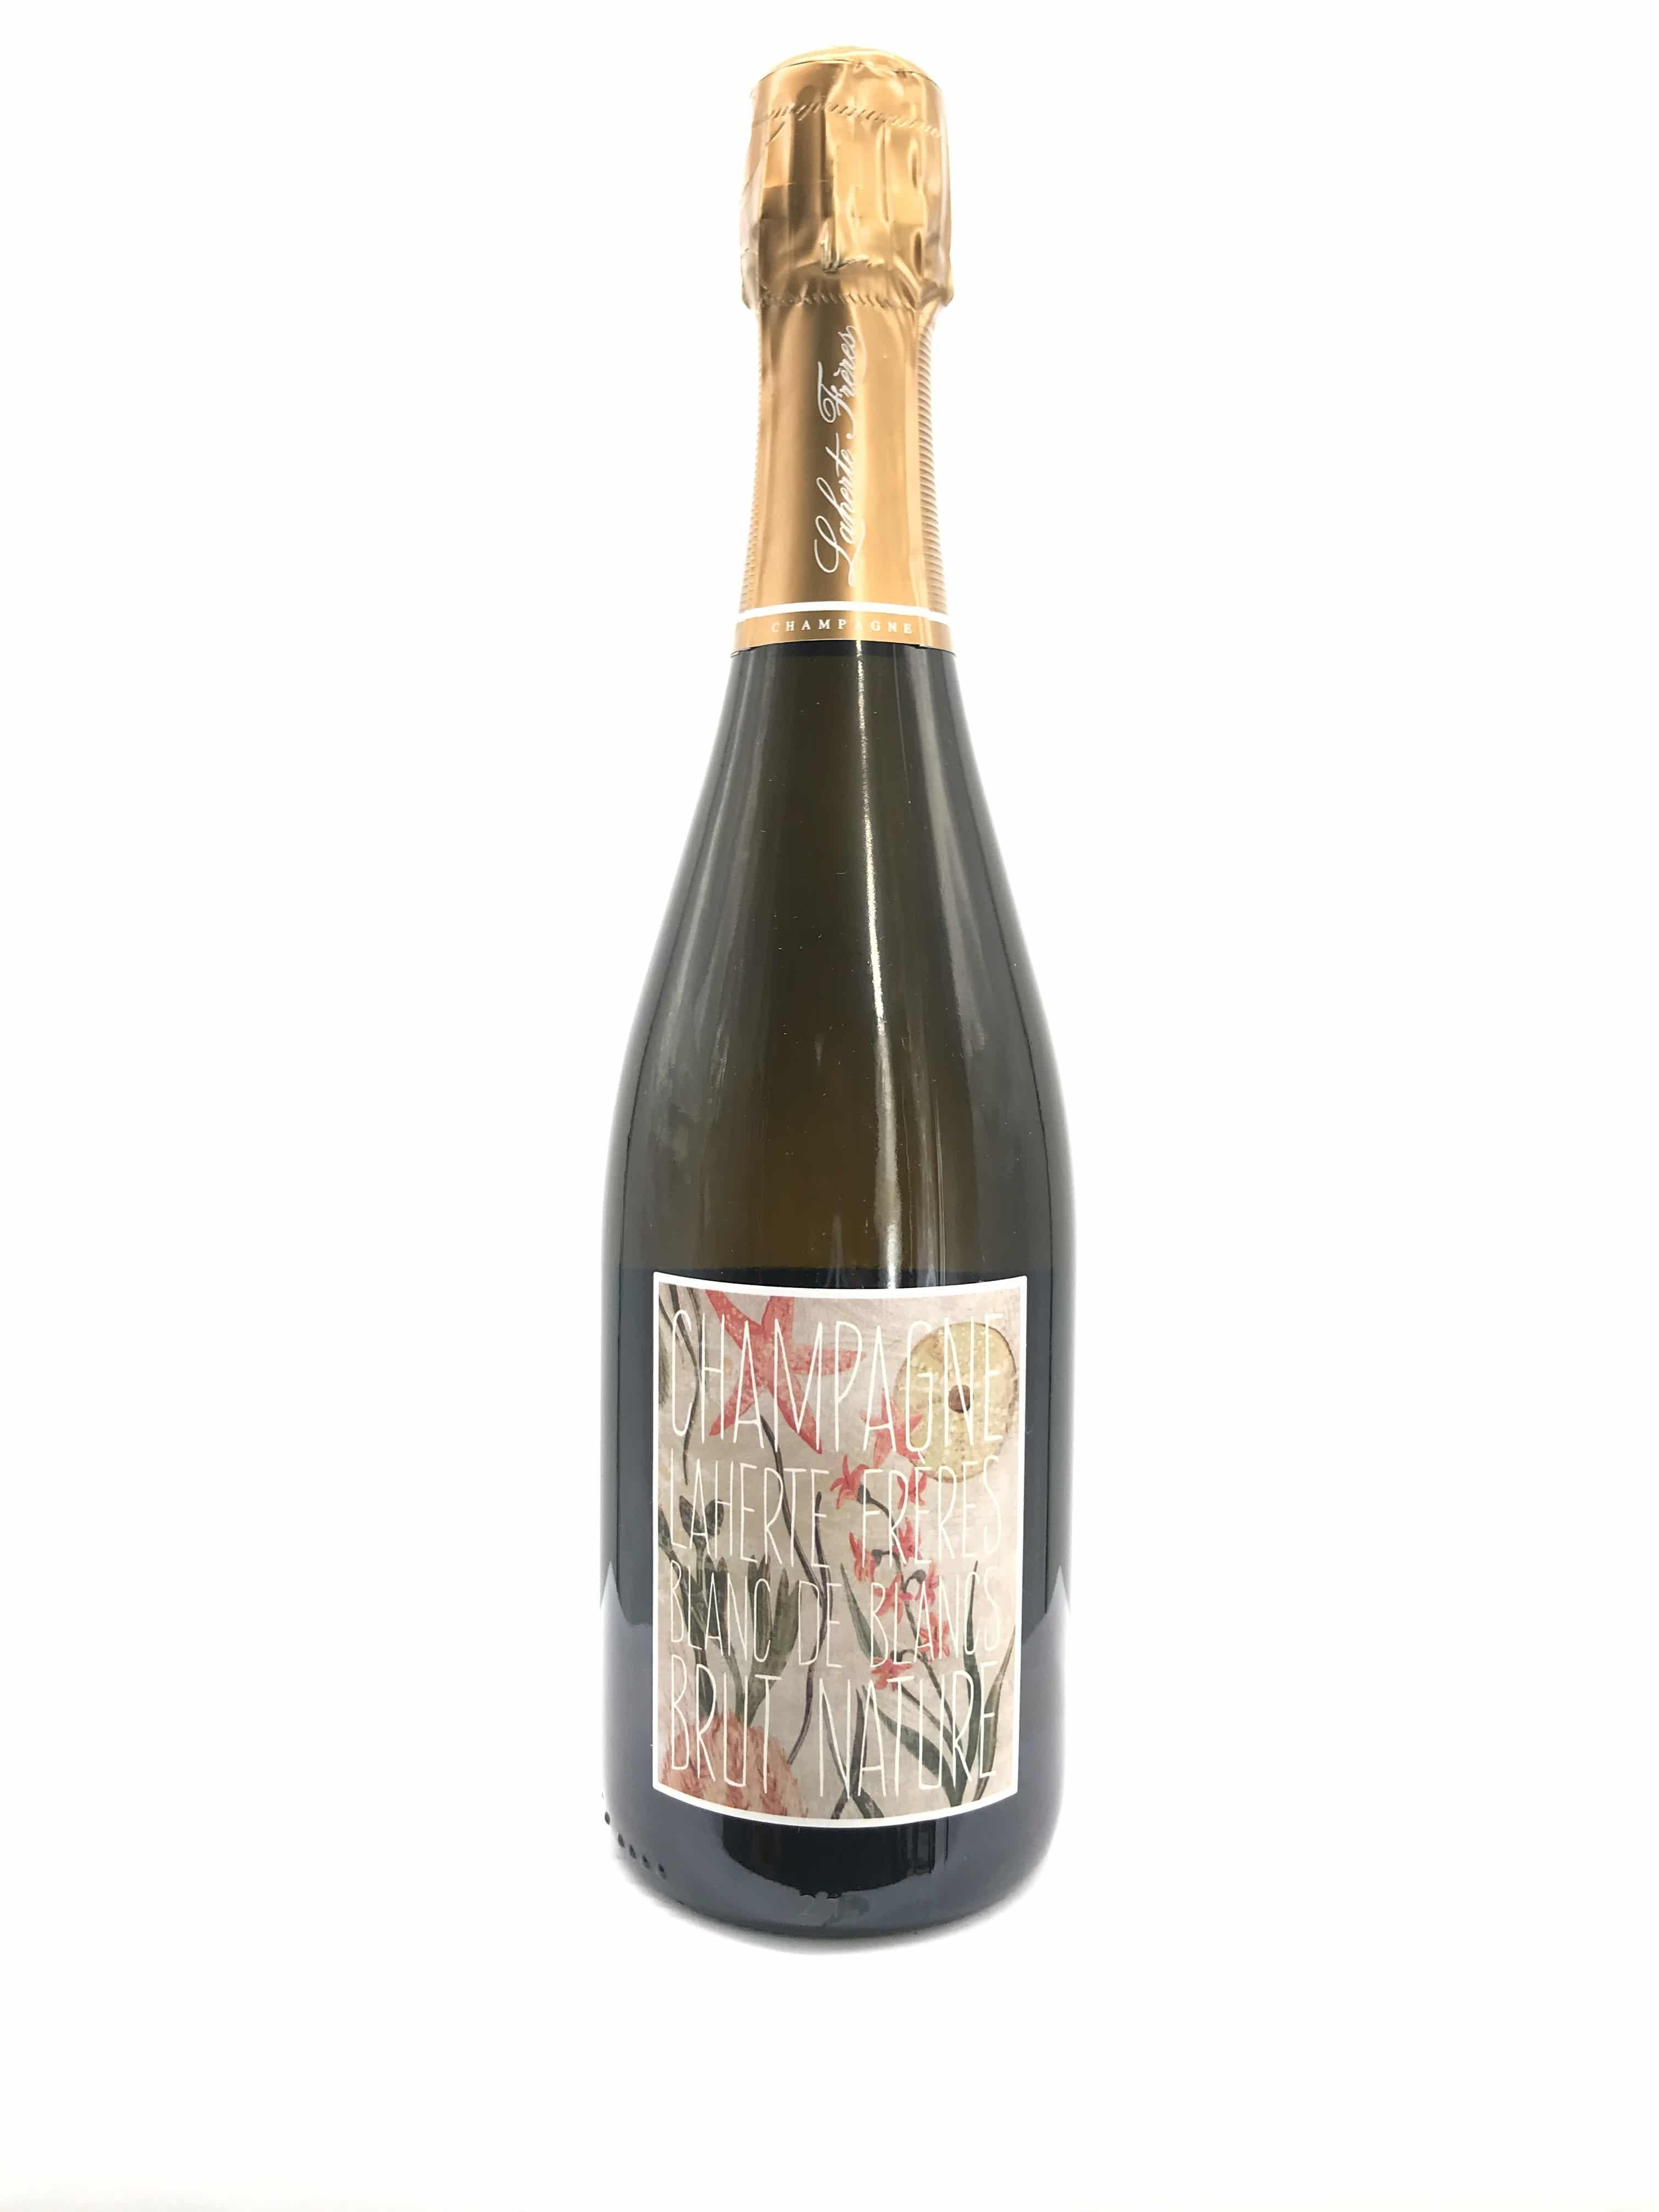 Champagne Laherte Freres Blanc de Blancs Brut Nature